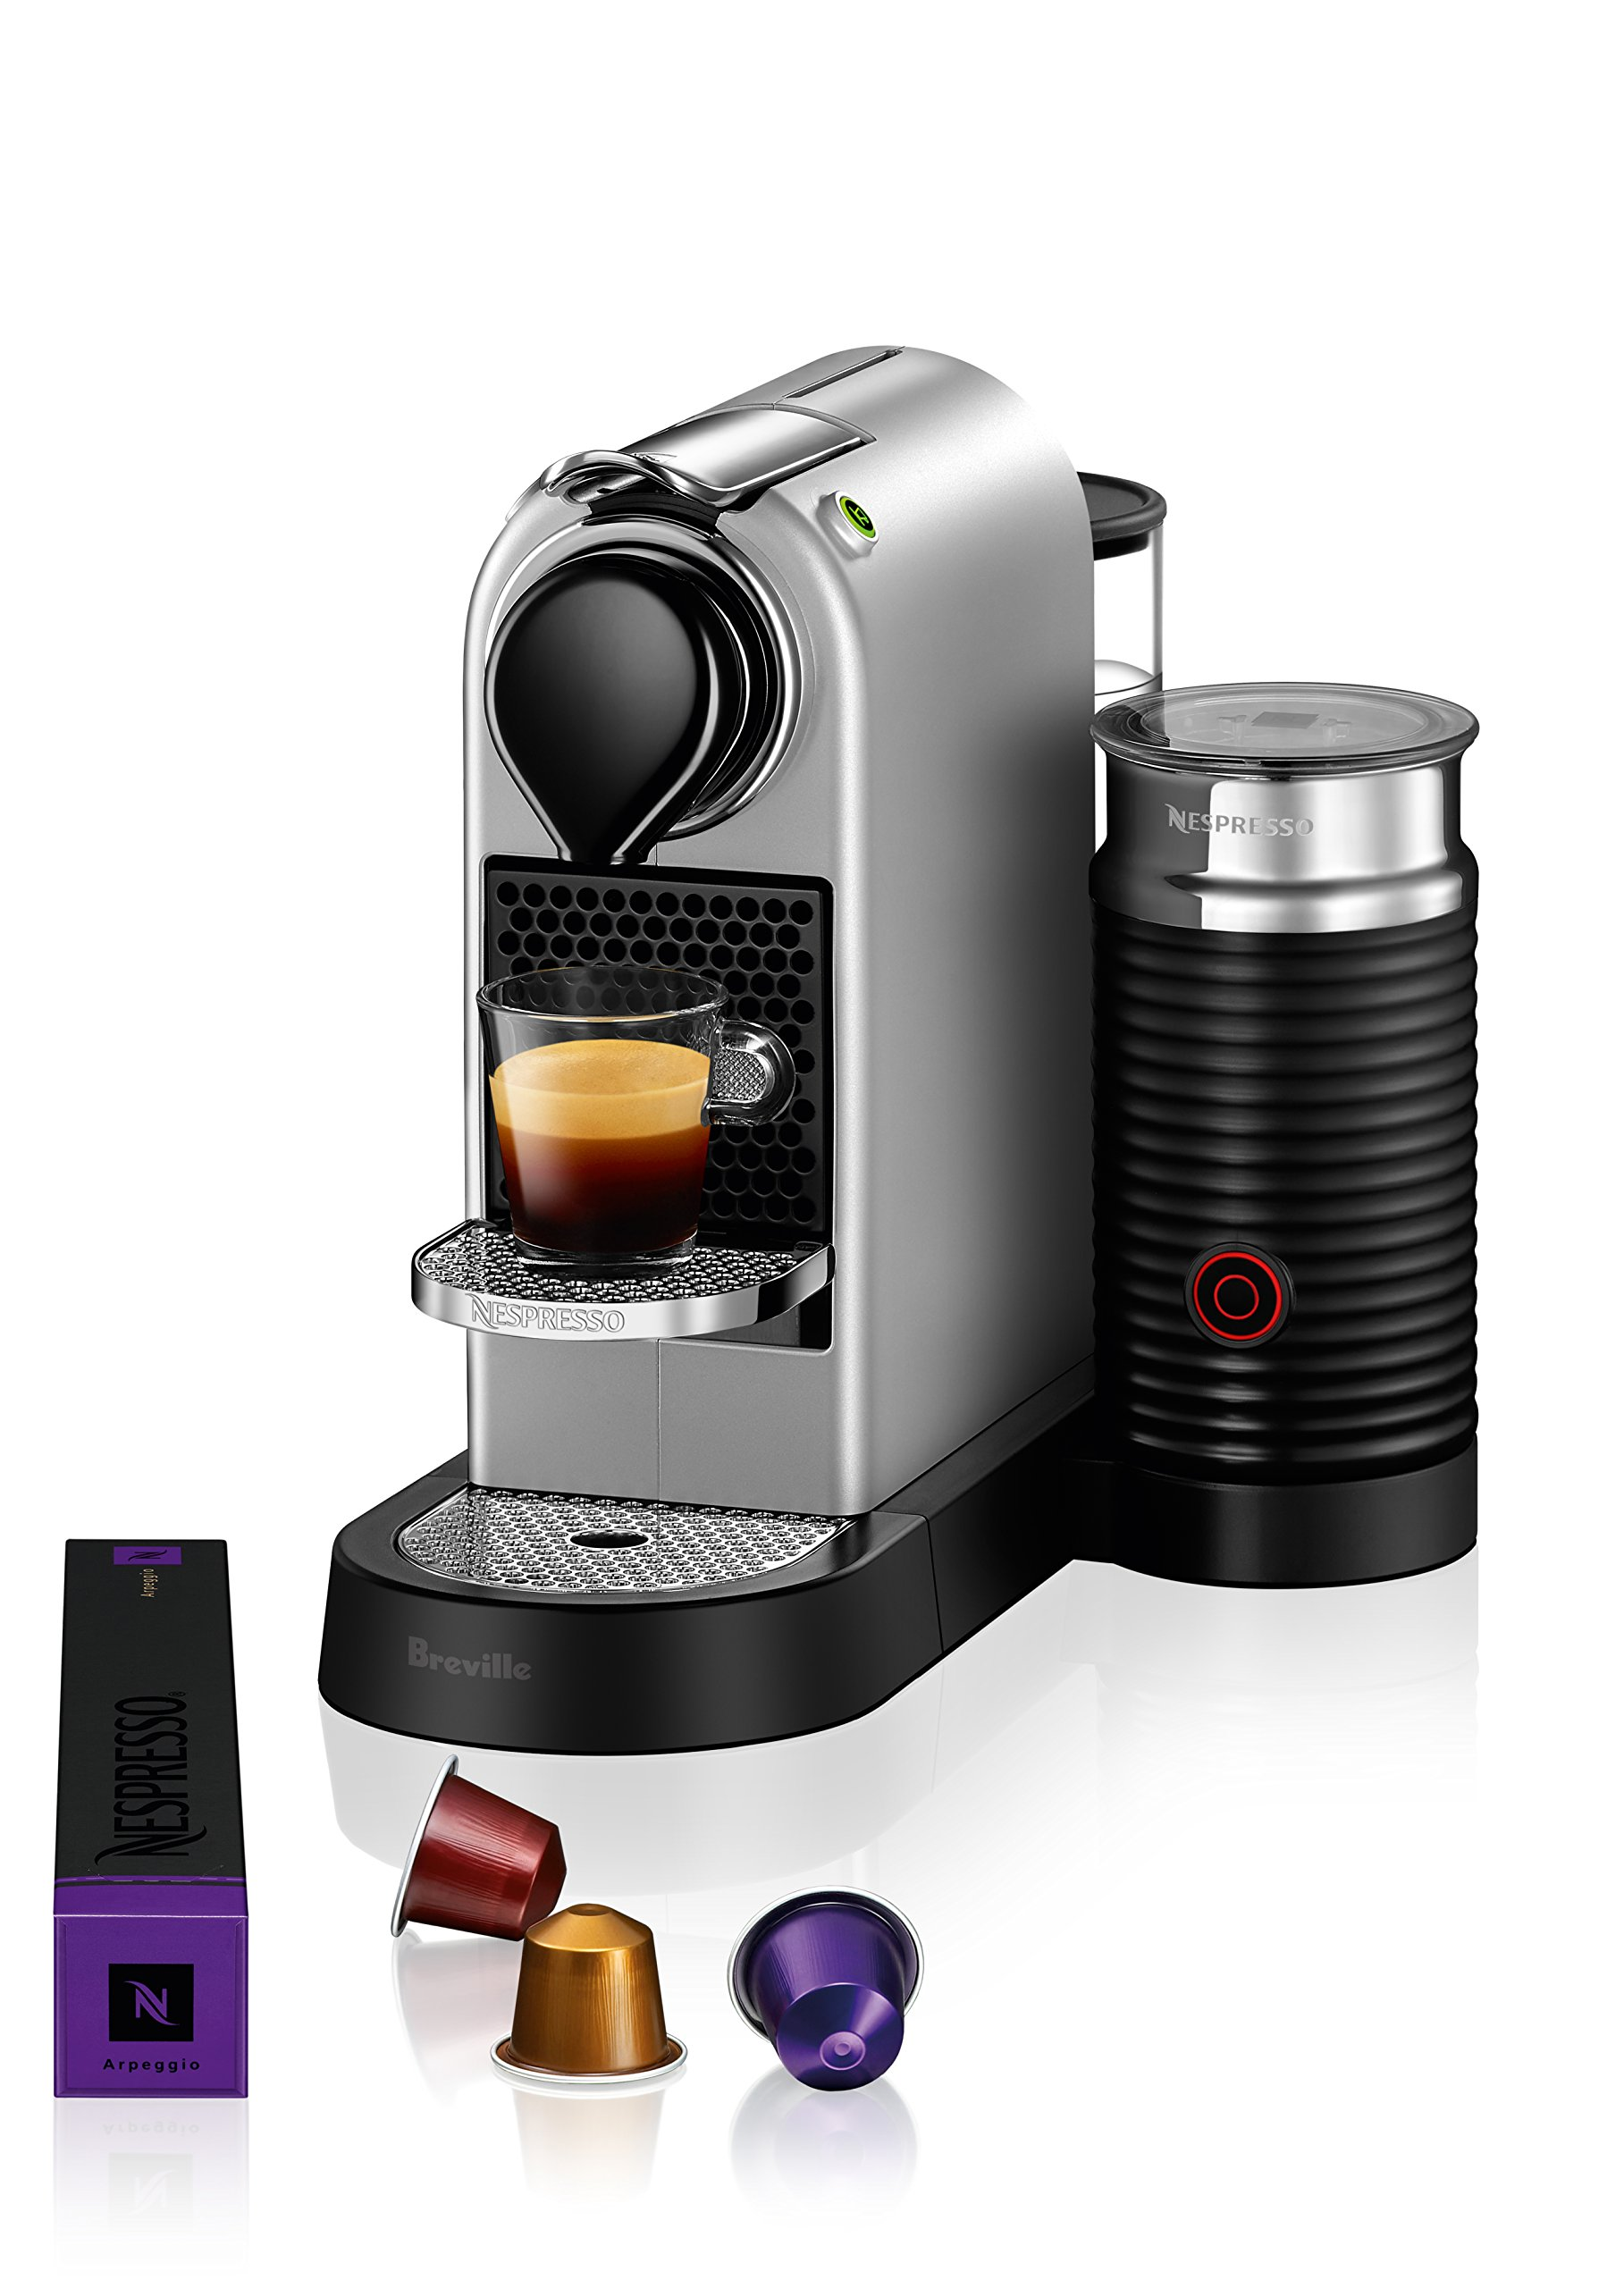 Nespresso CitiZ Espresso Machine Bundle with Aeroccino Milk Frother by Breville, Silver by Breville